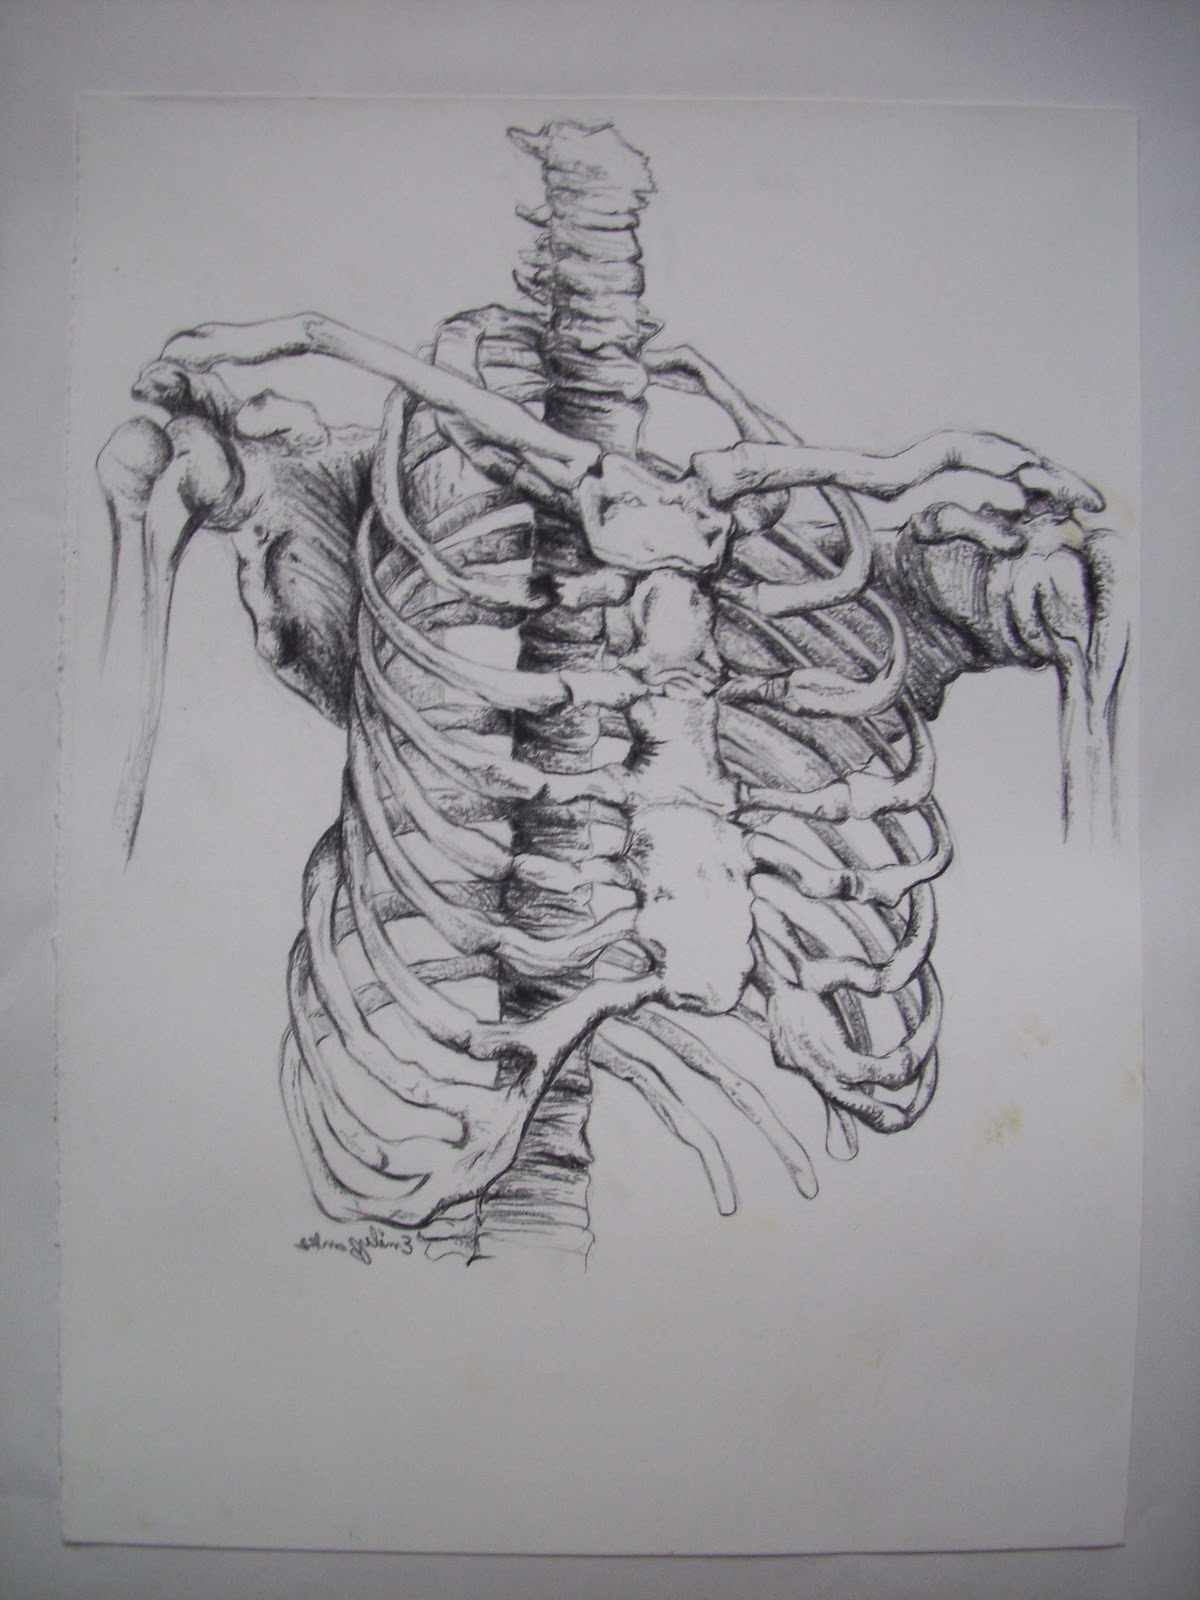 Emily Banks' Art And Animation: Anatomy And Life Drawing